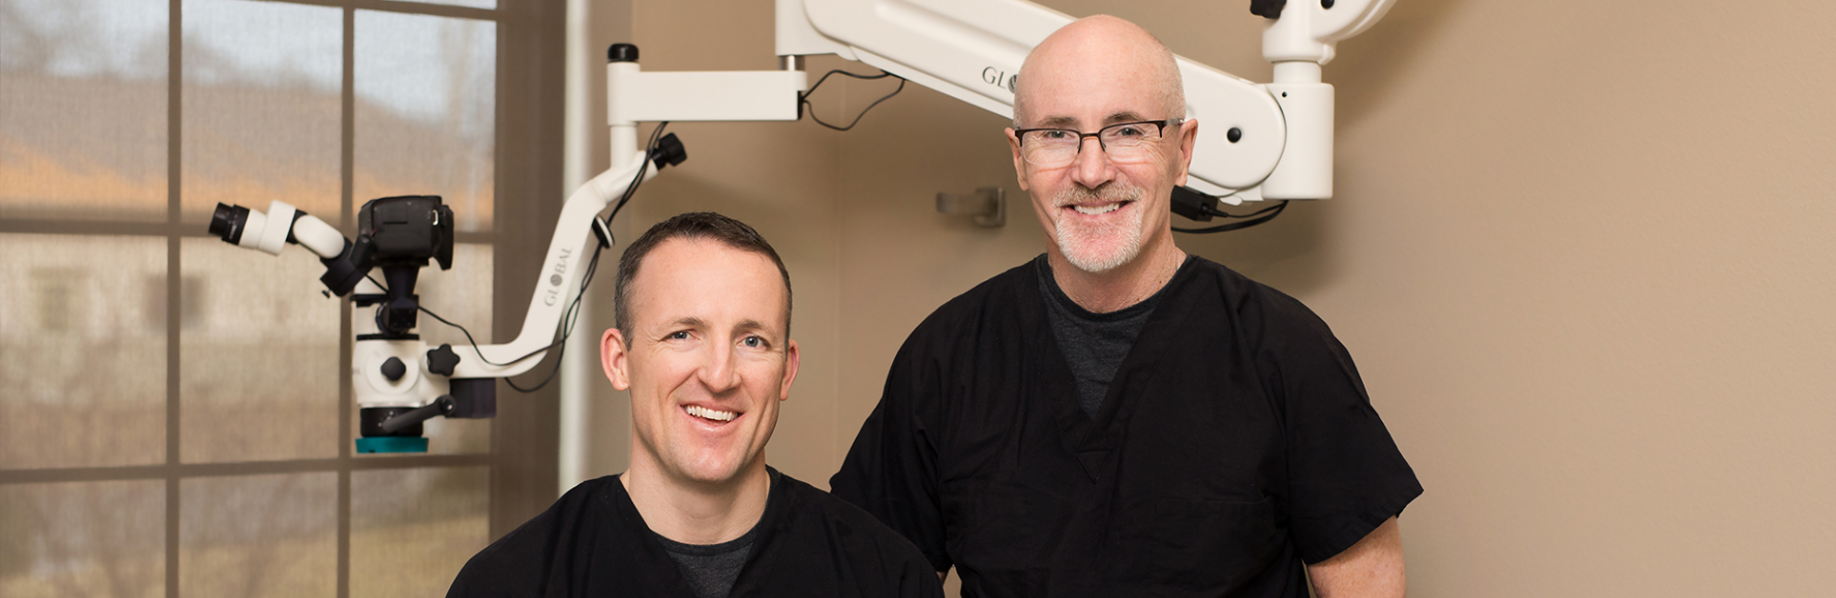 Eastern Iowa Endodontics Reviews, Ratings | Endodontists near 2929 Center Point Rd NE , Cedar Rapids IA